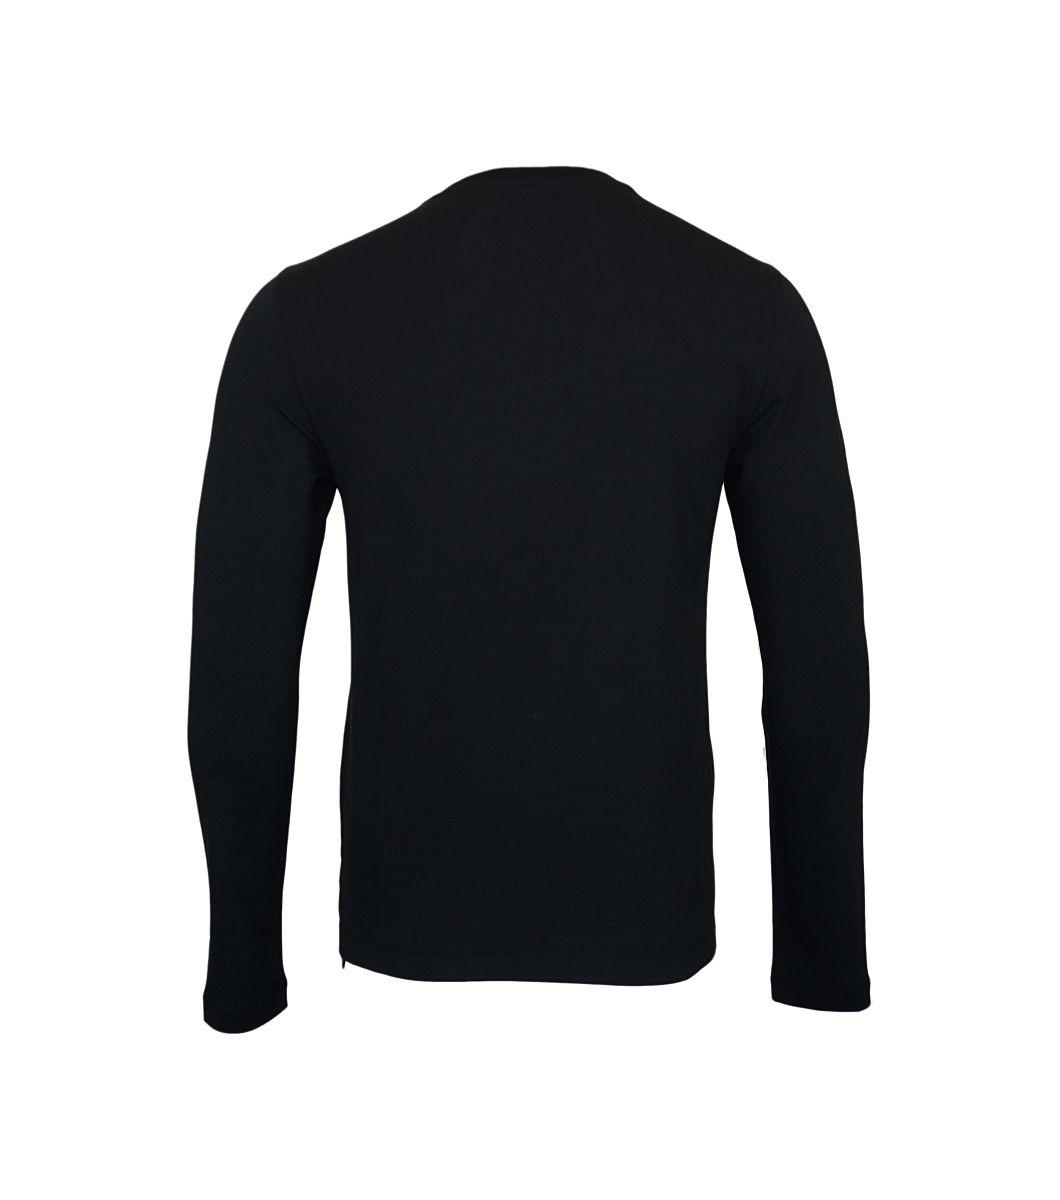 EA7 Emporio Armani Longsleeve Shirt 6YPTB3 PJ20Z 22BN Black White HW17-EALS1